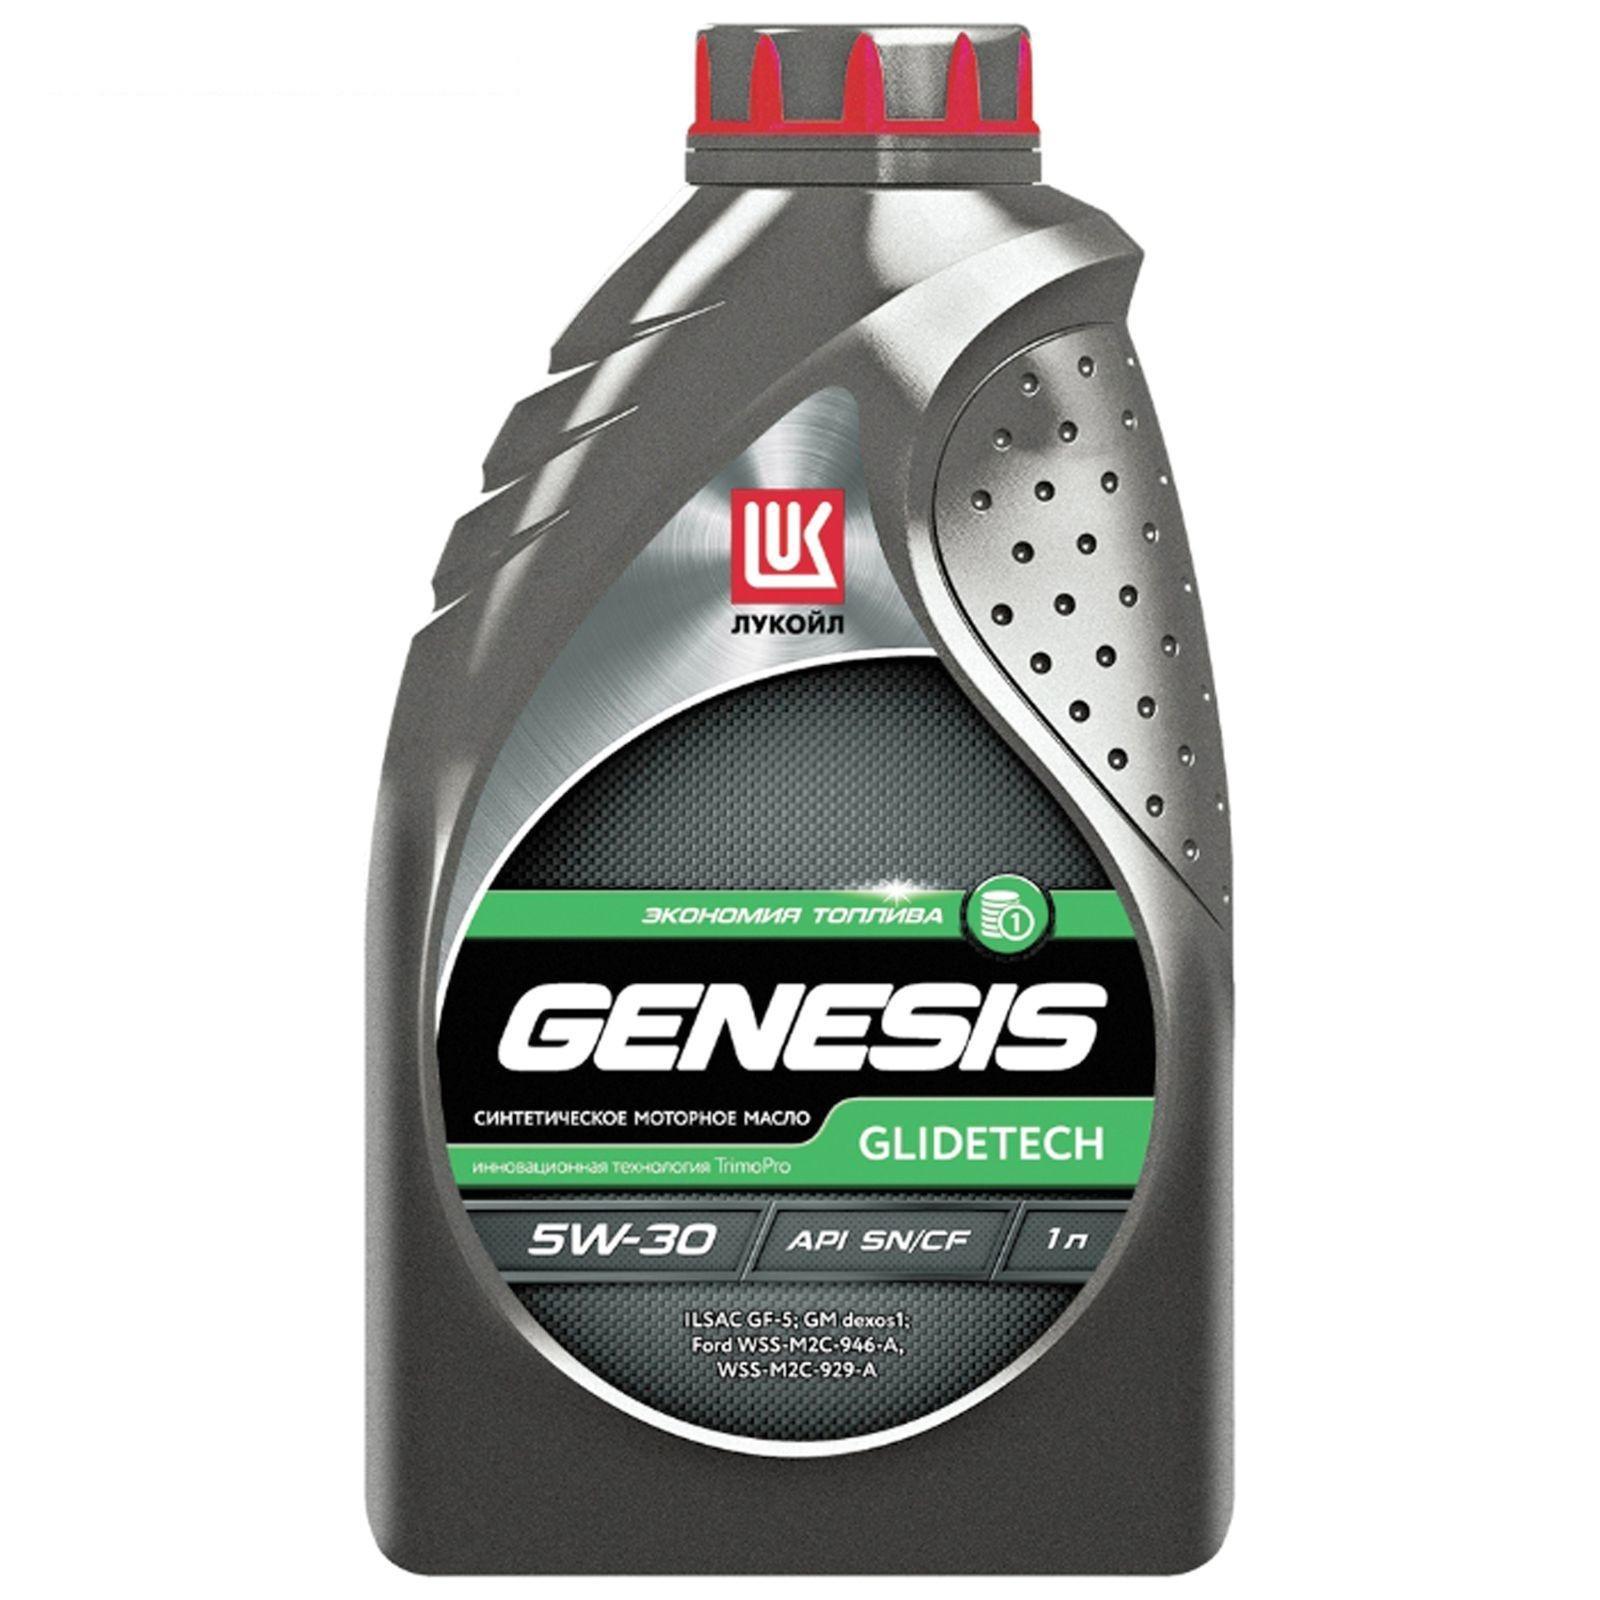 Лукойл Genesis Glidetech 5W-30 - Синтетическое моторное масло